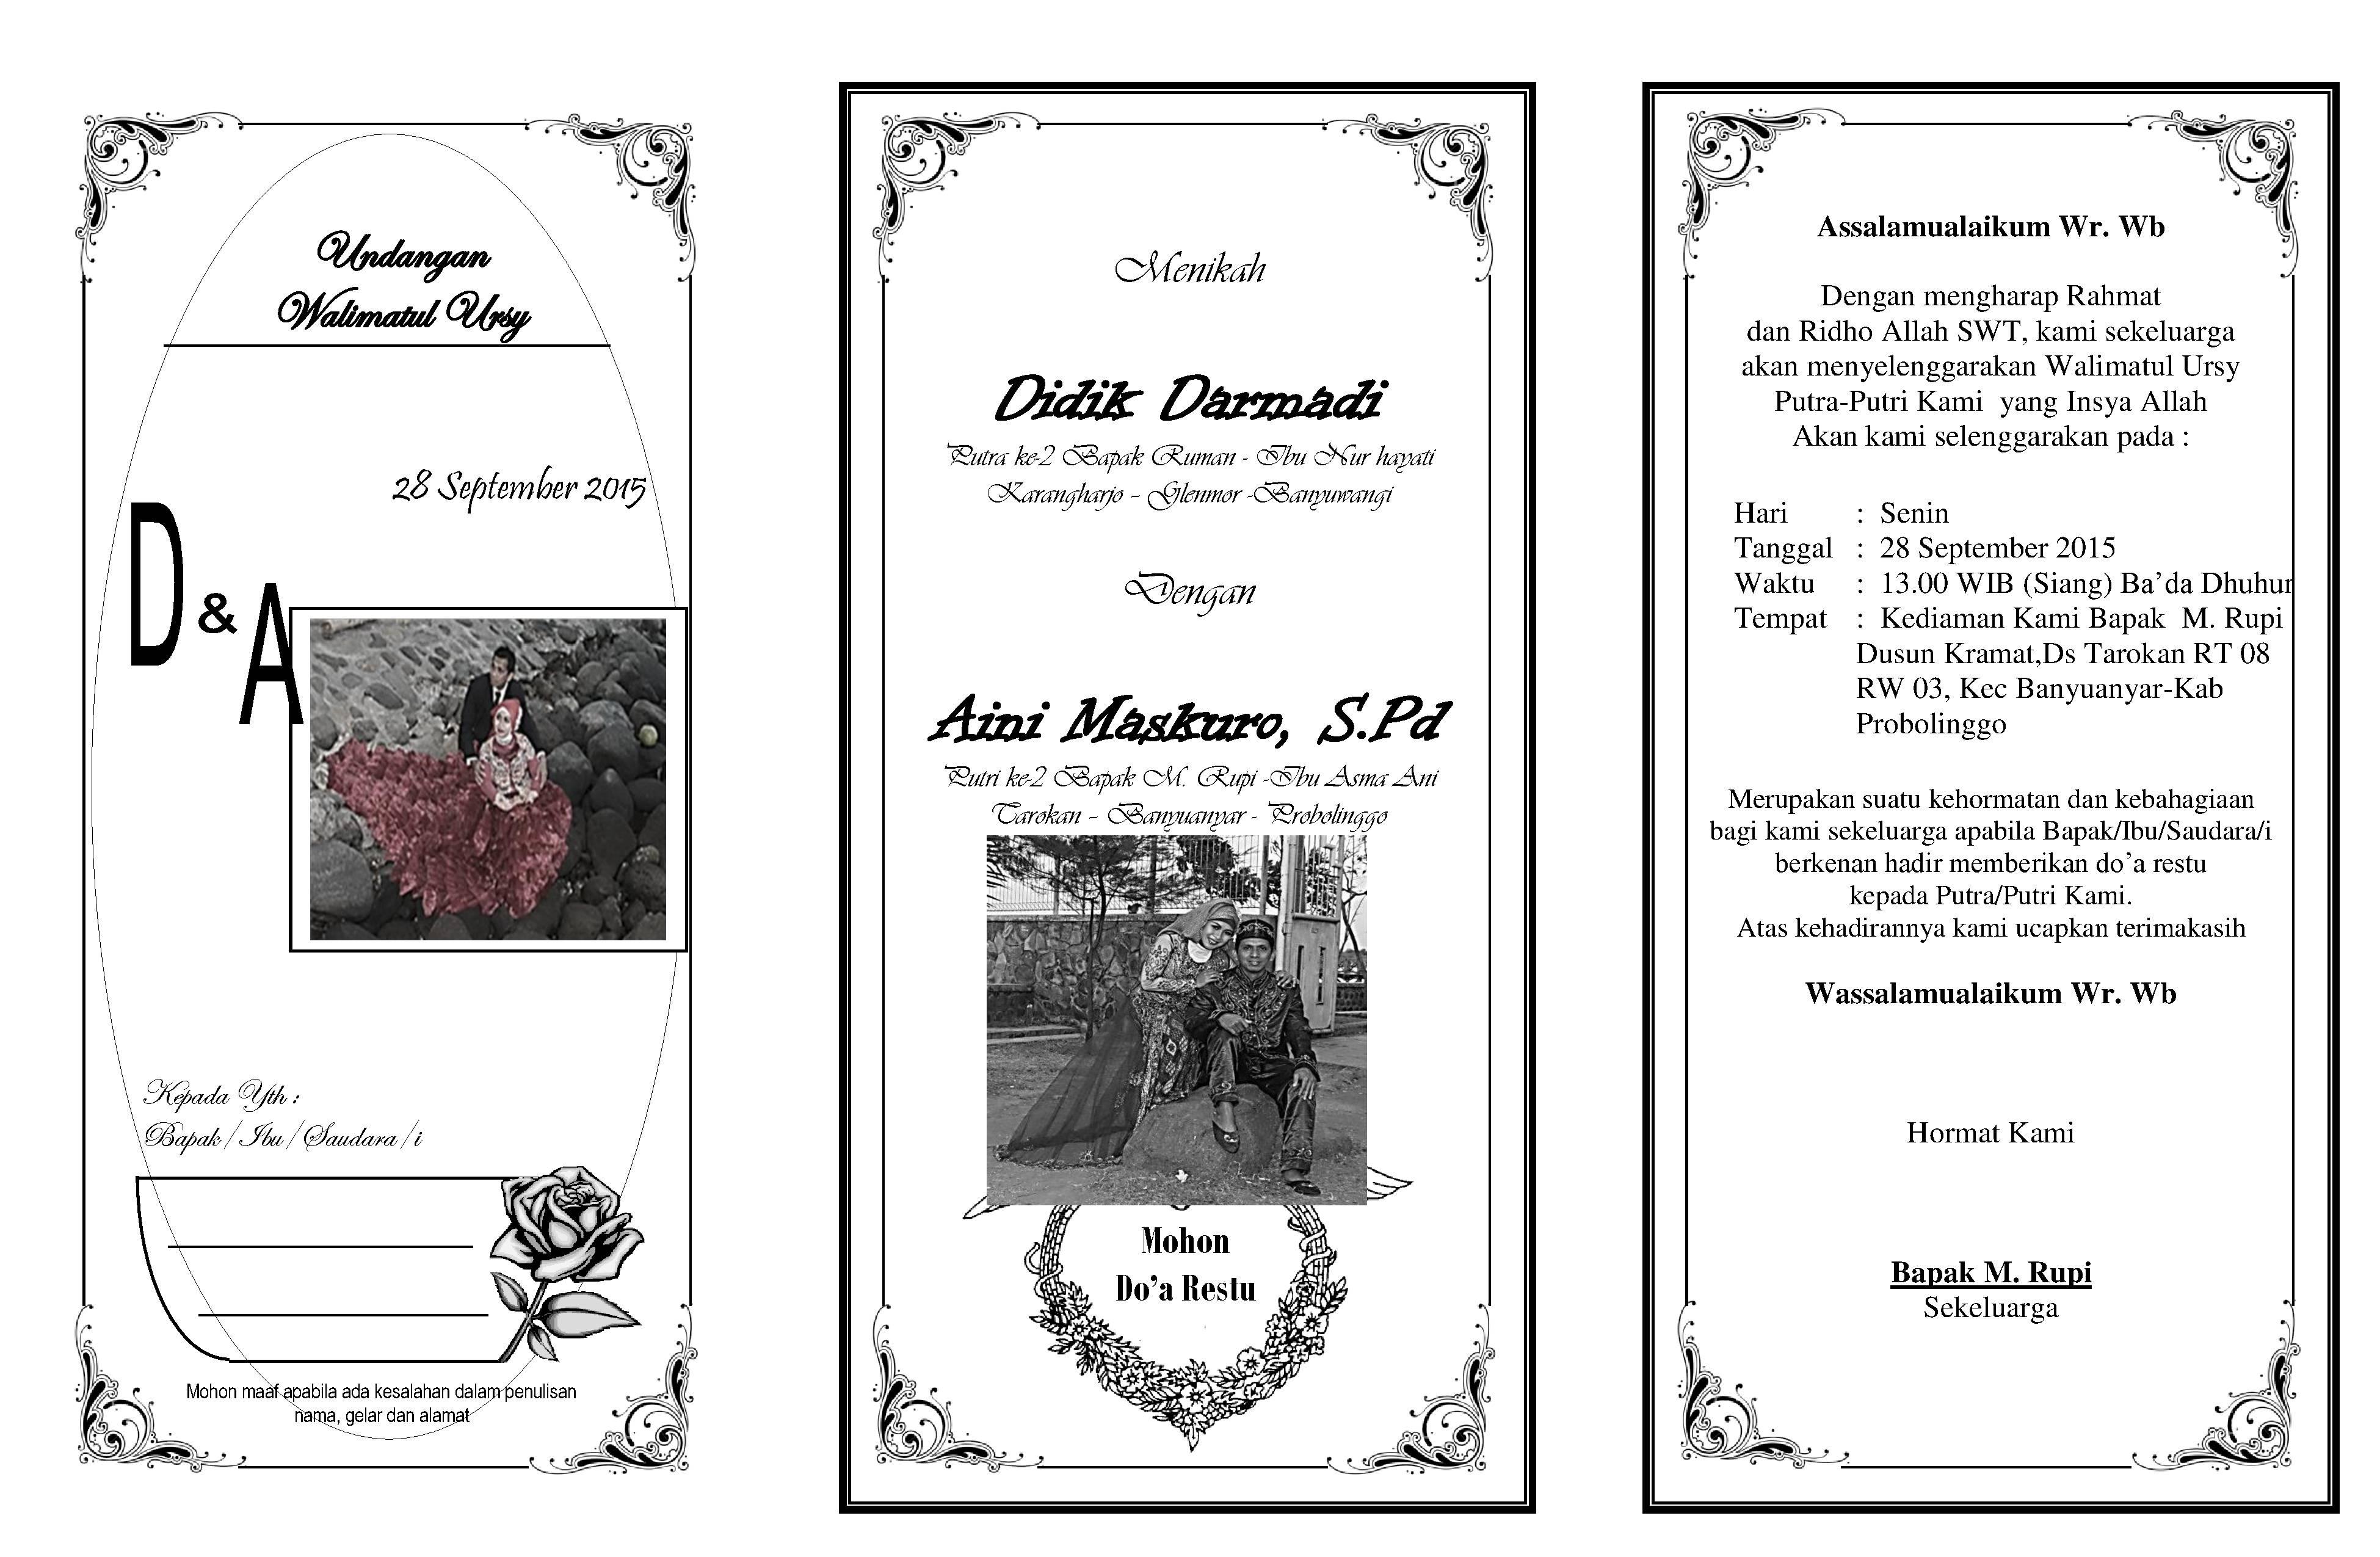 Undangan Walimatul Ursy Atau Syukuran Pernikahan Aimarusciencemania